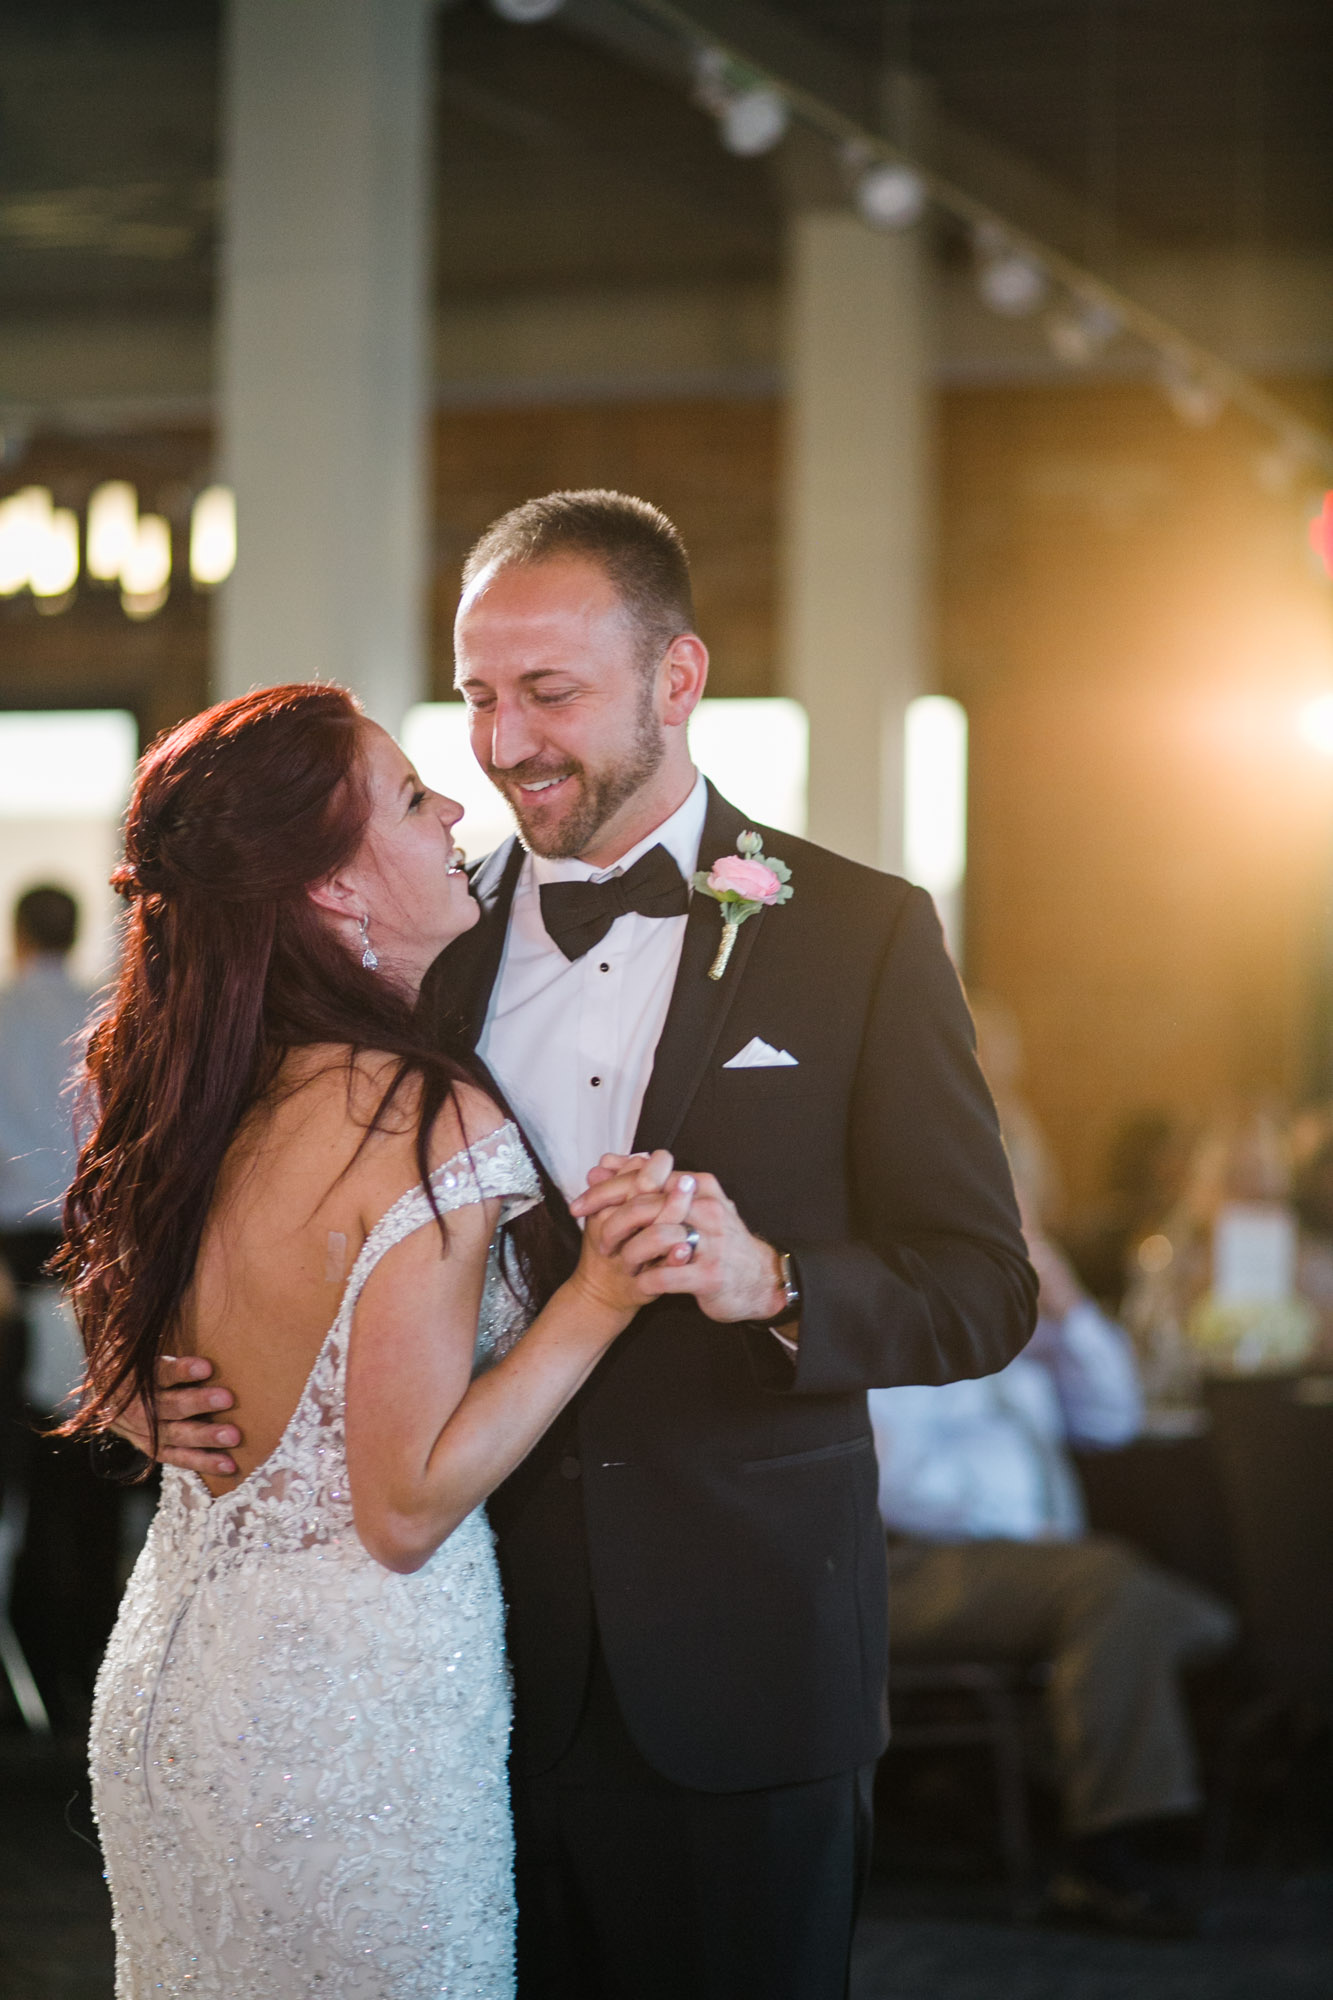 hensville-wedding-downtown-toledo-ohio (98 of 103).jpg